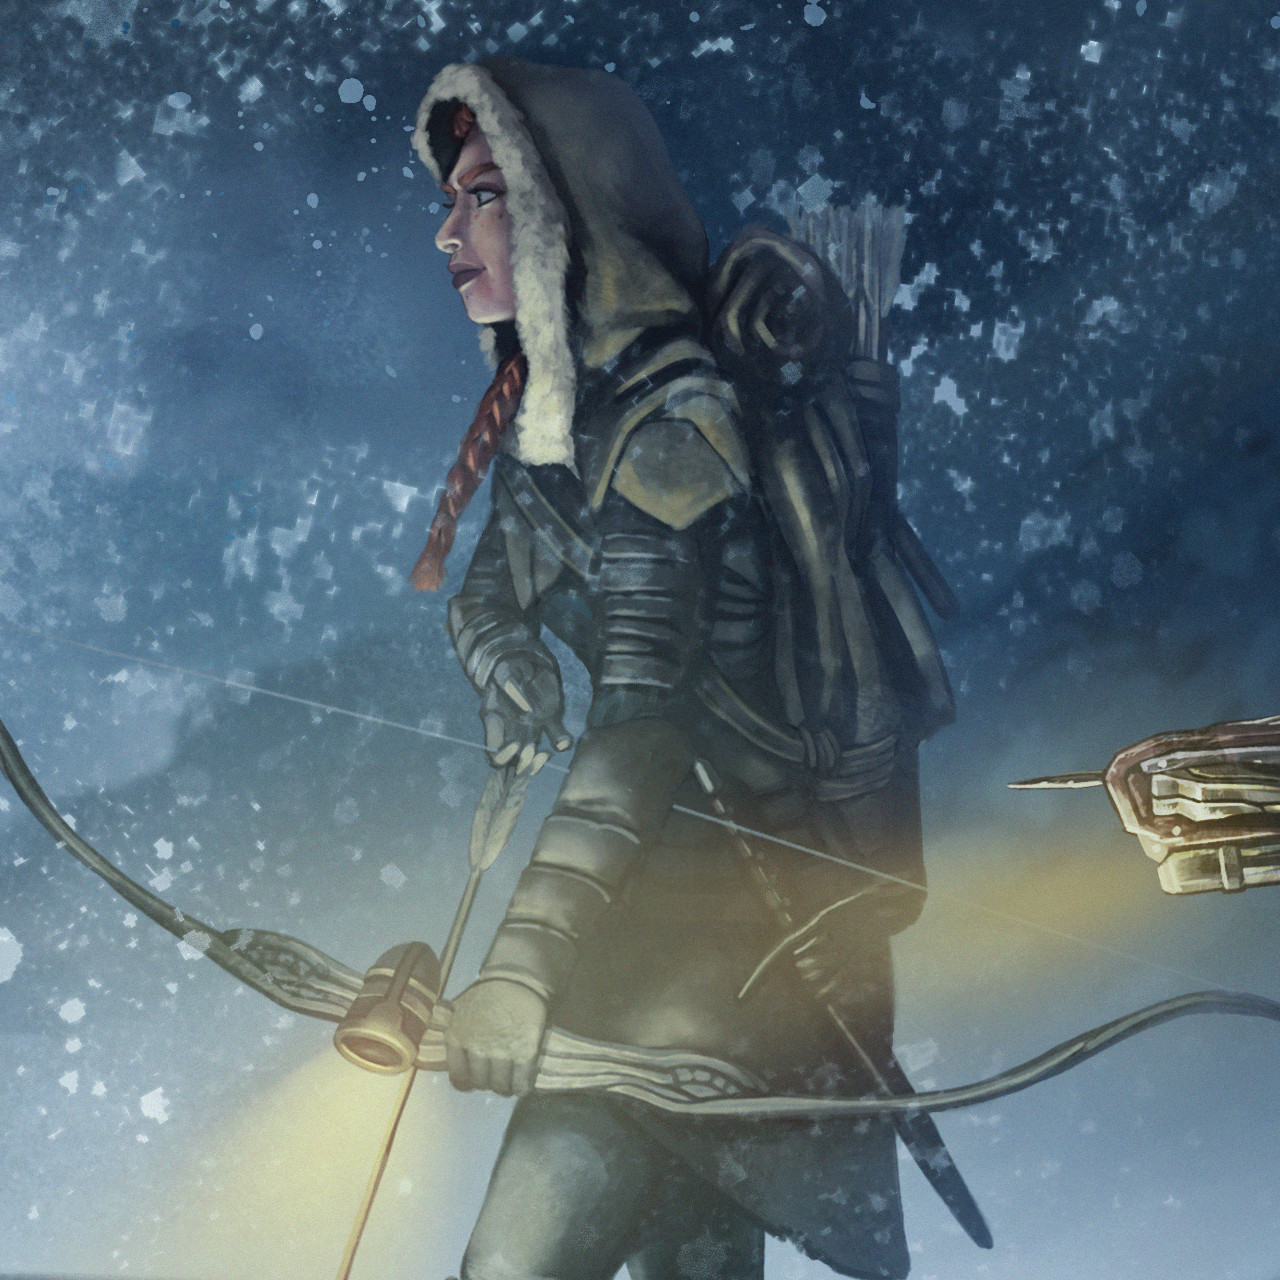 Dan ramos winter escudo det 07